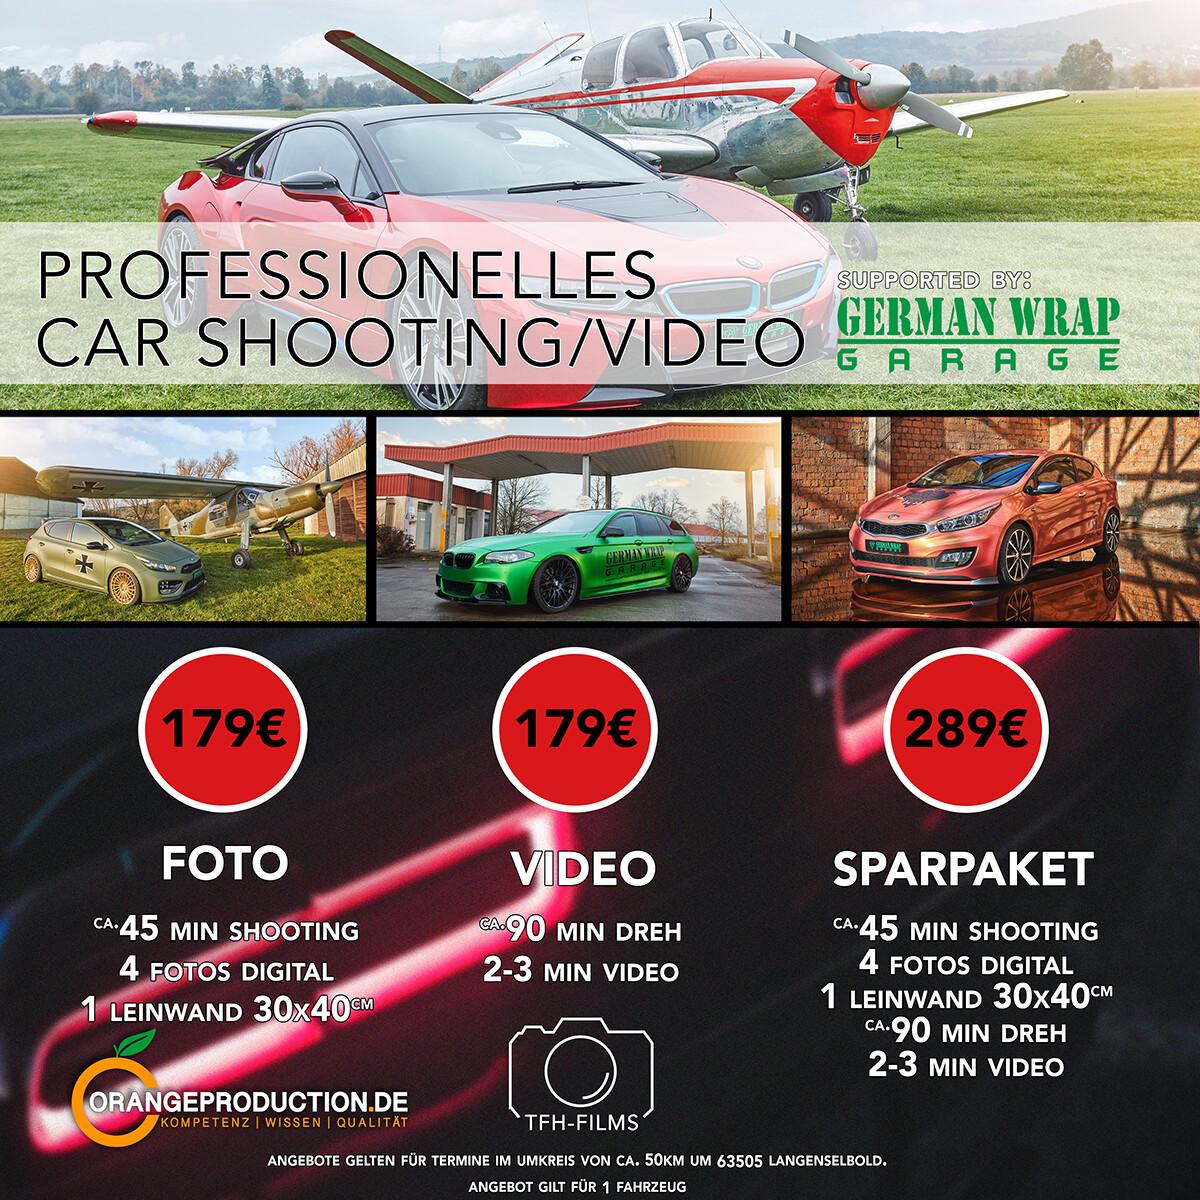 Carporn Video/Fotoshooting